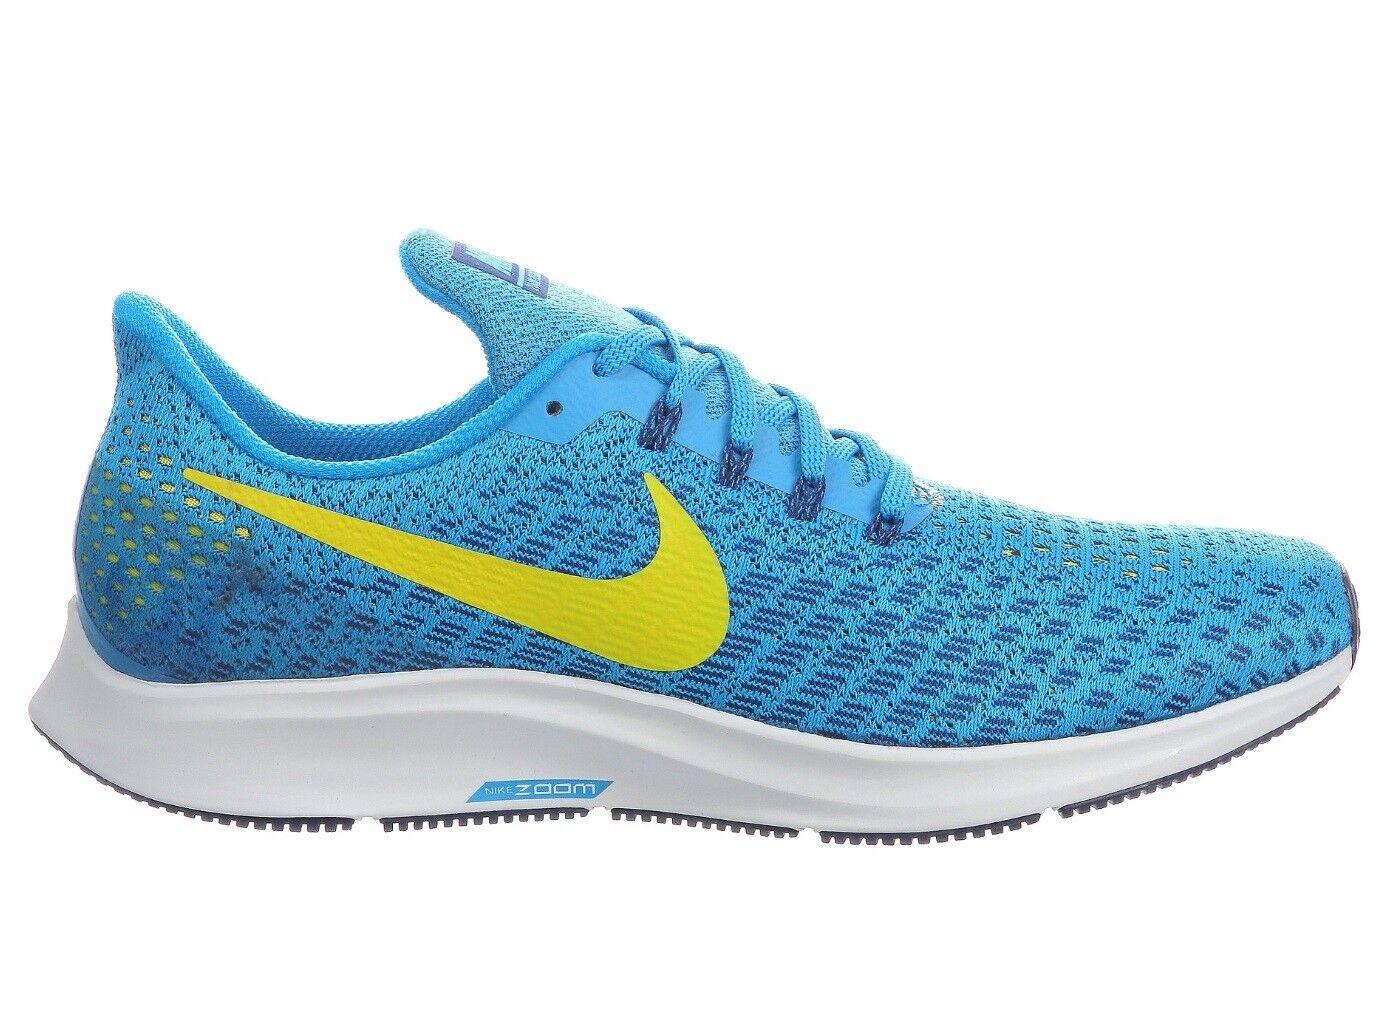 Nike Air Zoom Pegasus 35 Mens 942851-400 bluee Orbit Running shoes Size 8